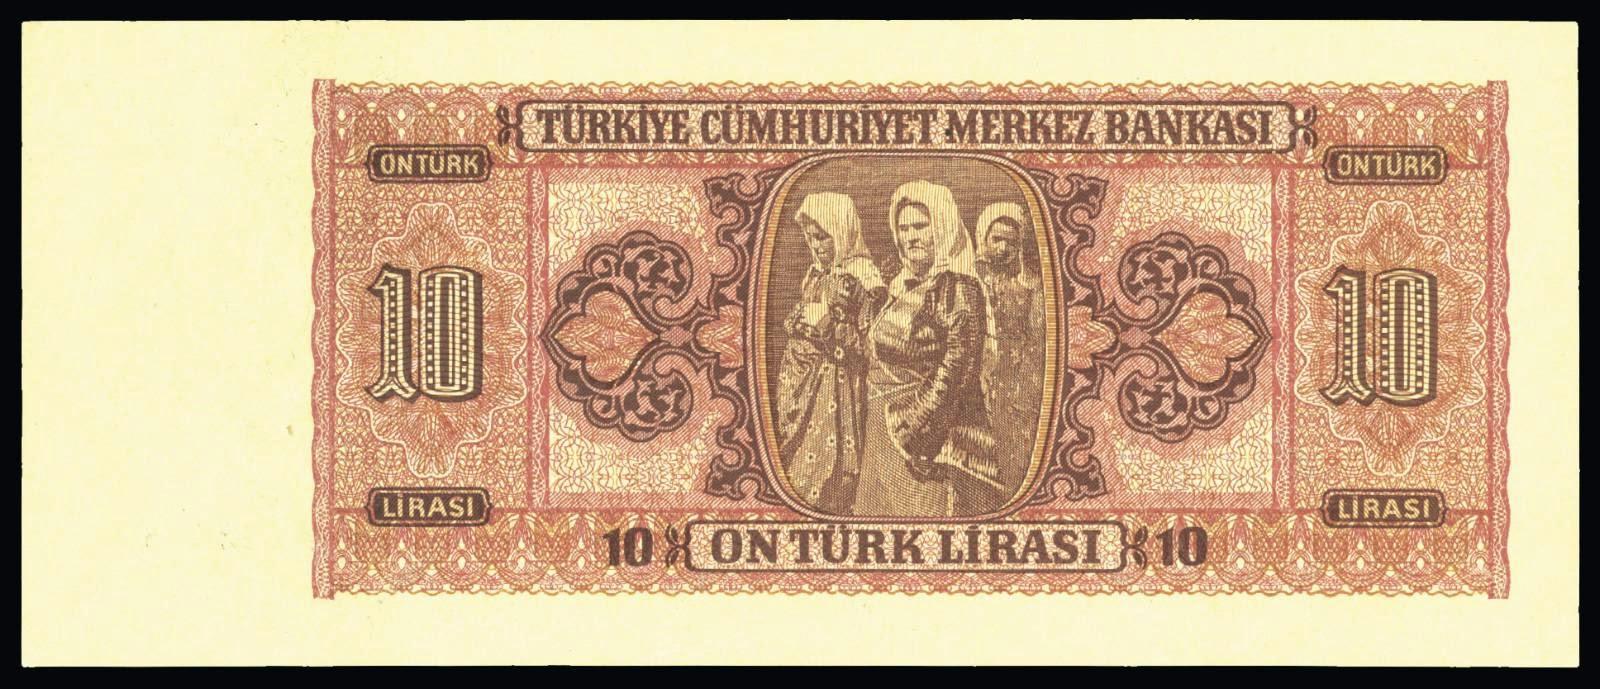 Turkish money pictures 10 Turkish Lira banknote